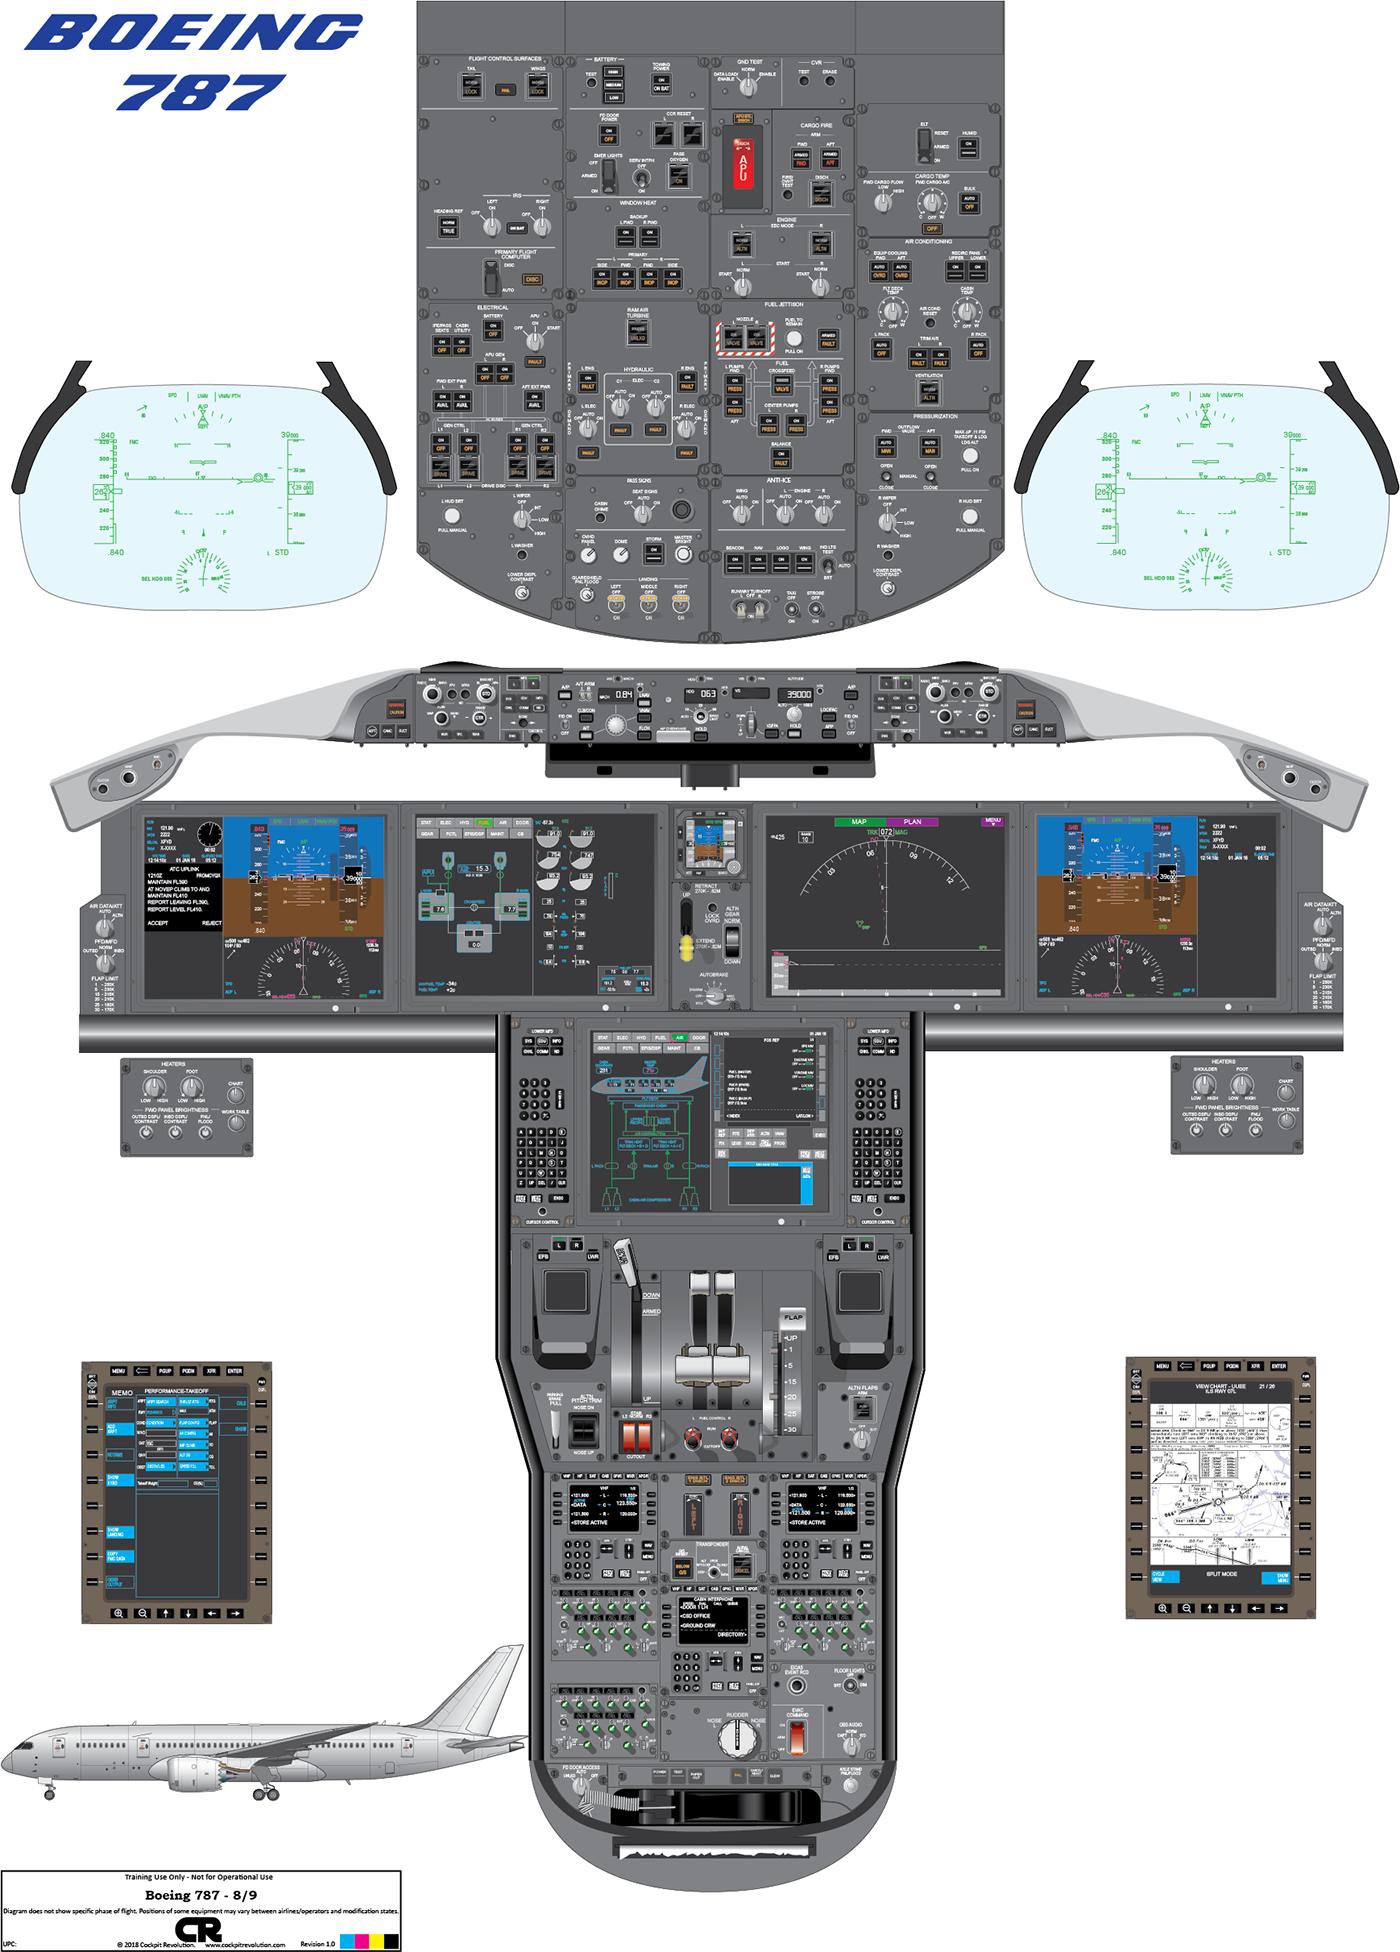 Aircraft Flight manual bombardier q400